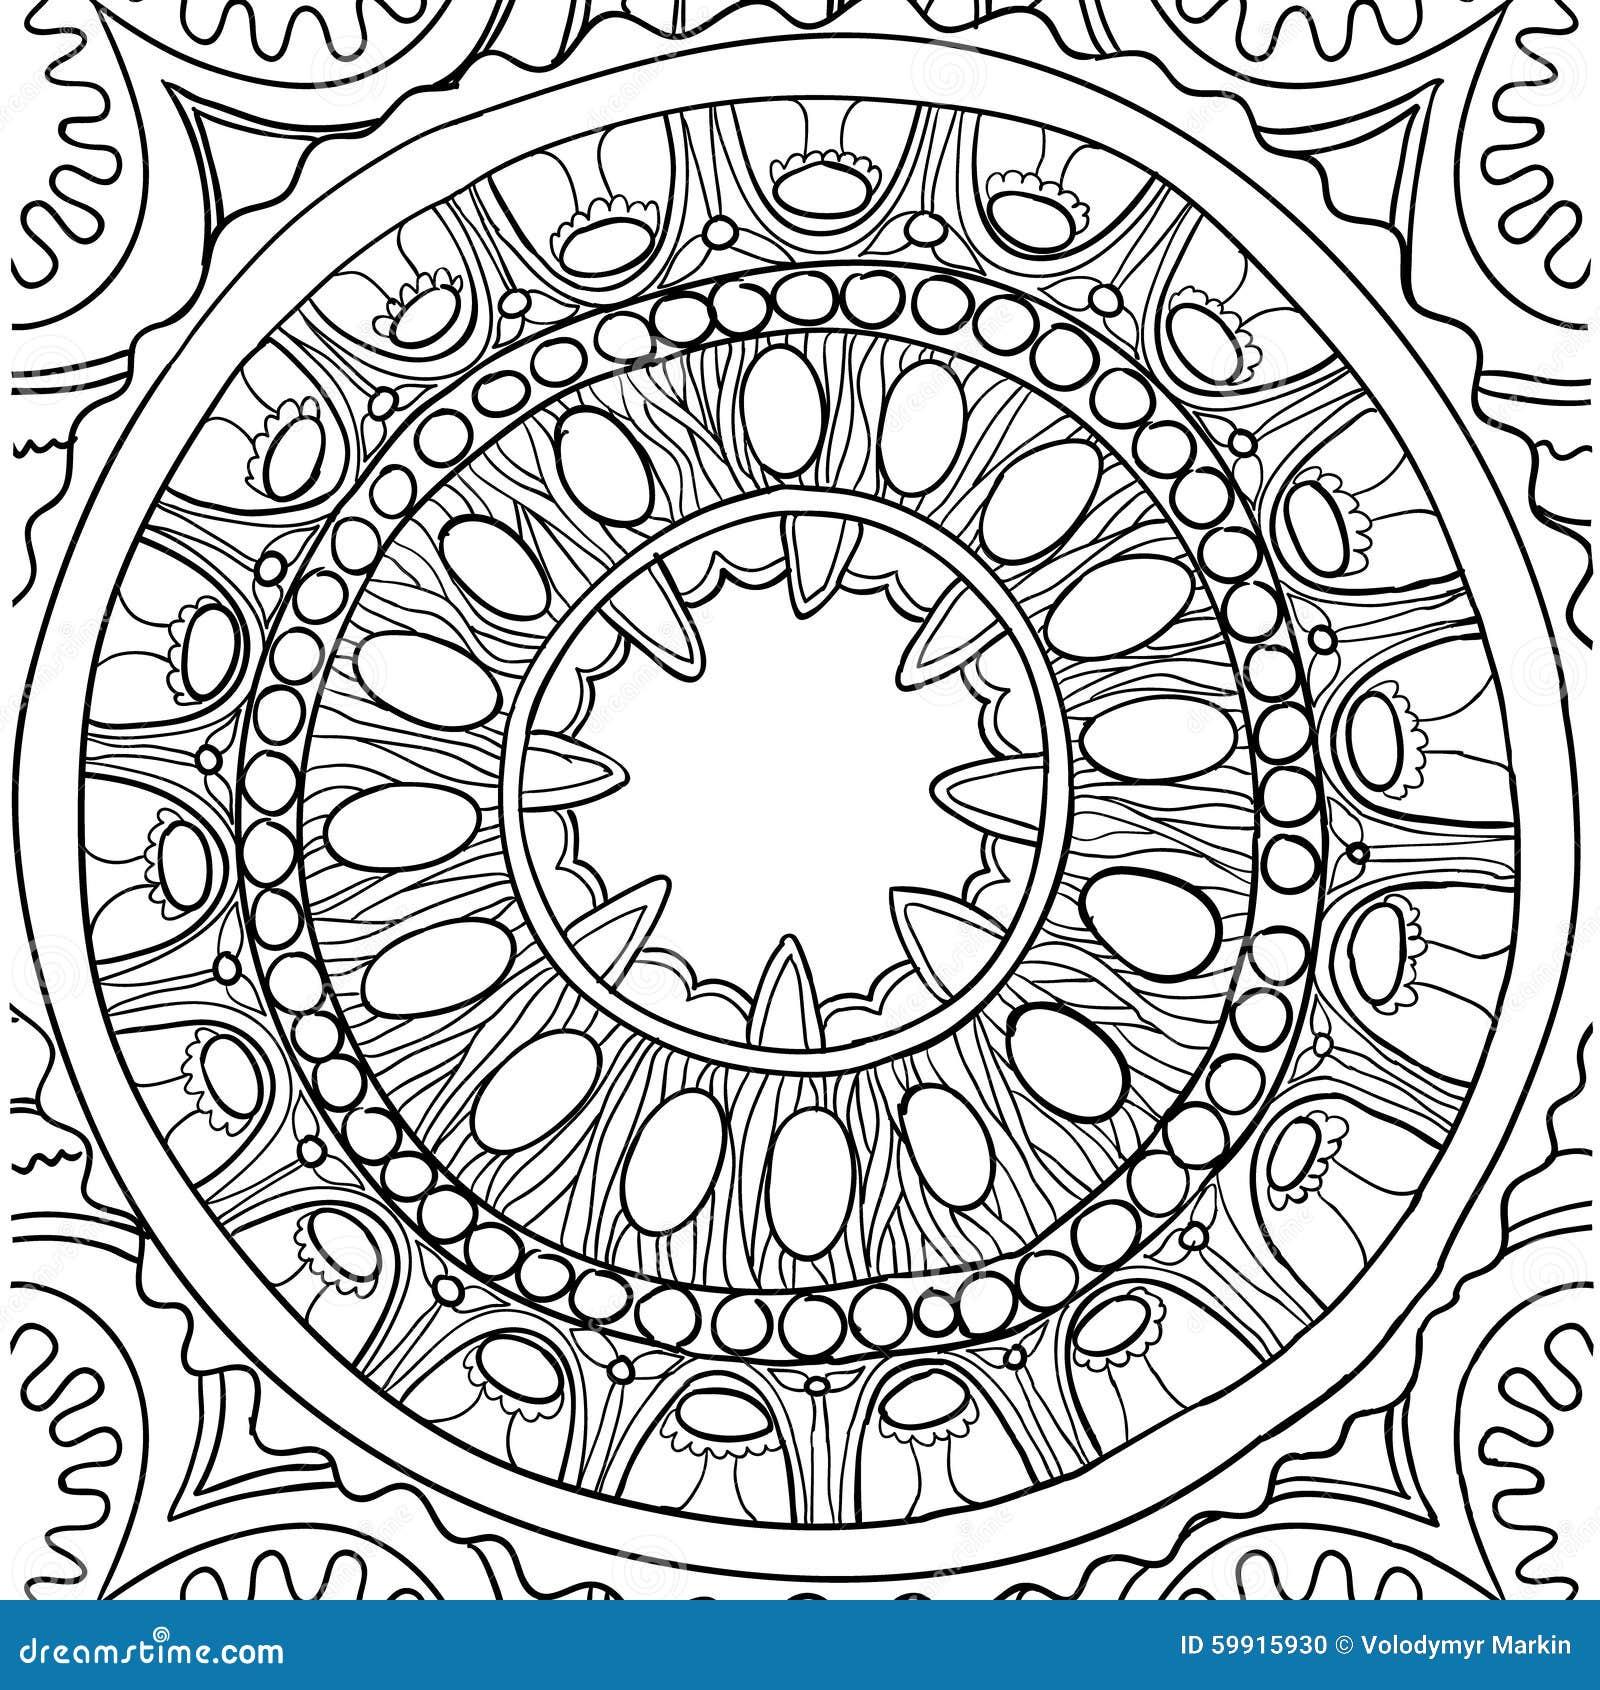 Black And White Ornament Floral Mandala Hand Drawn